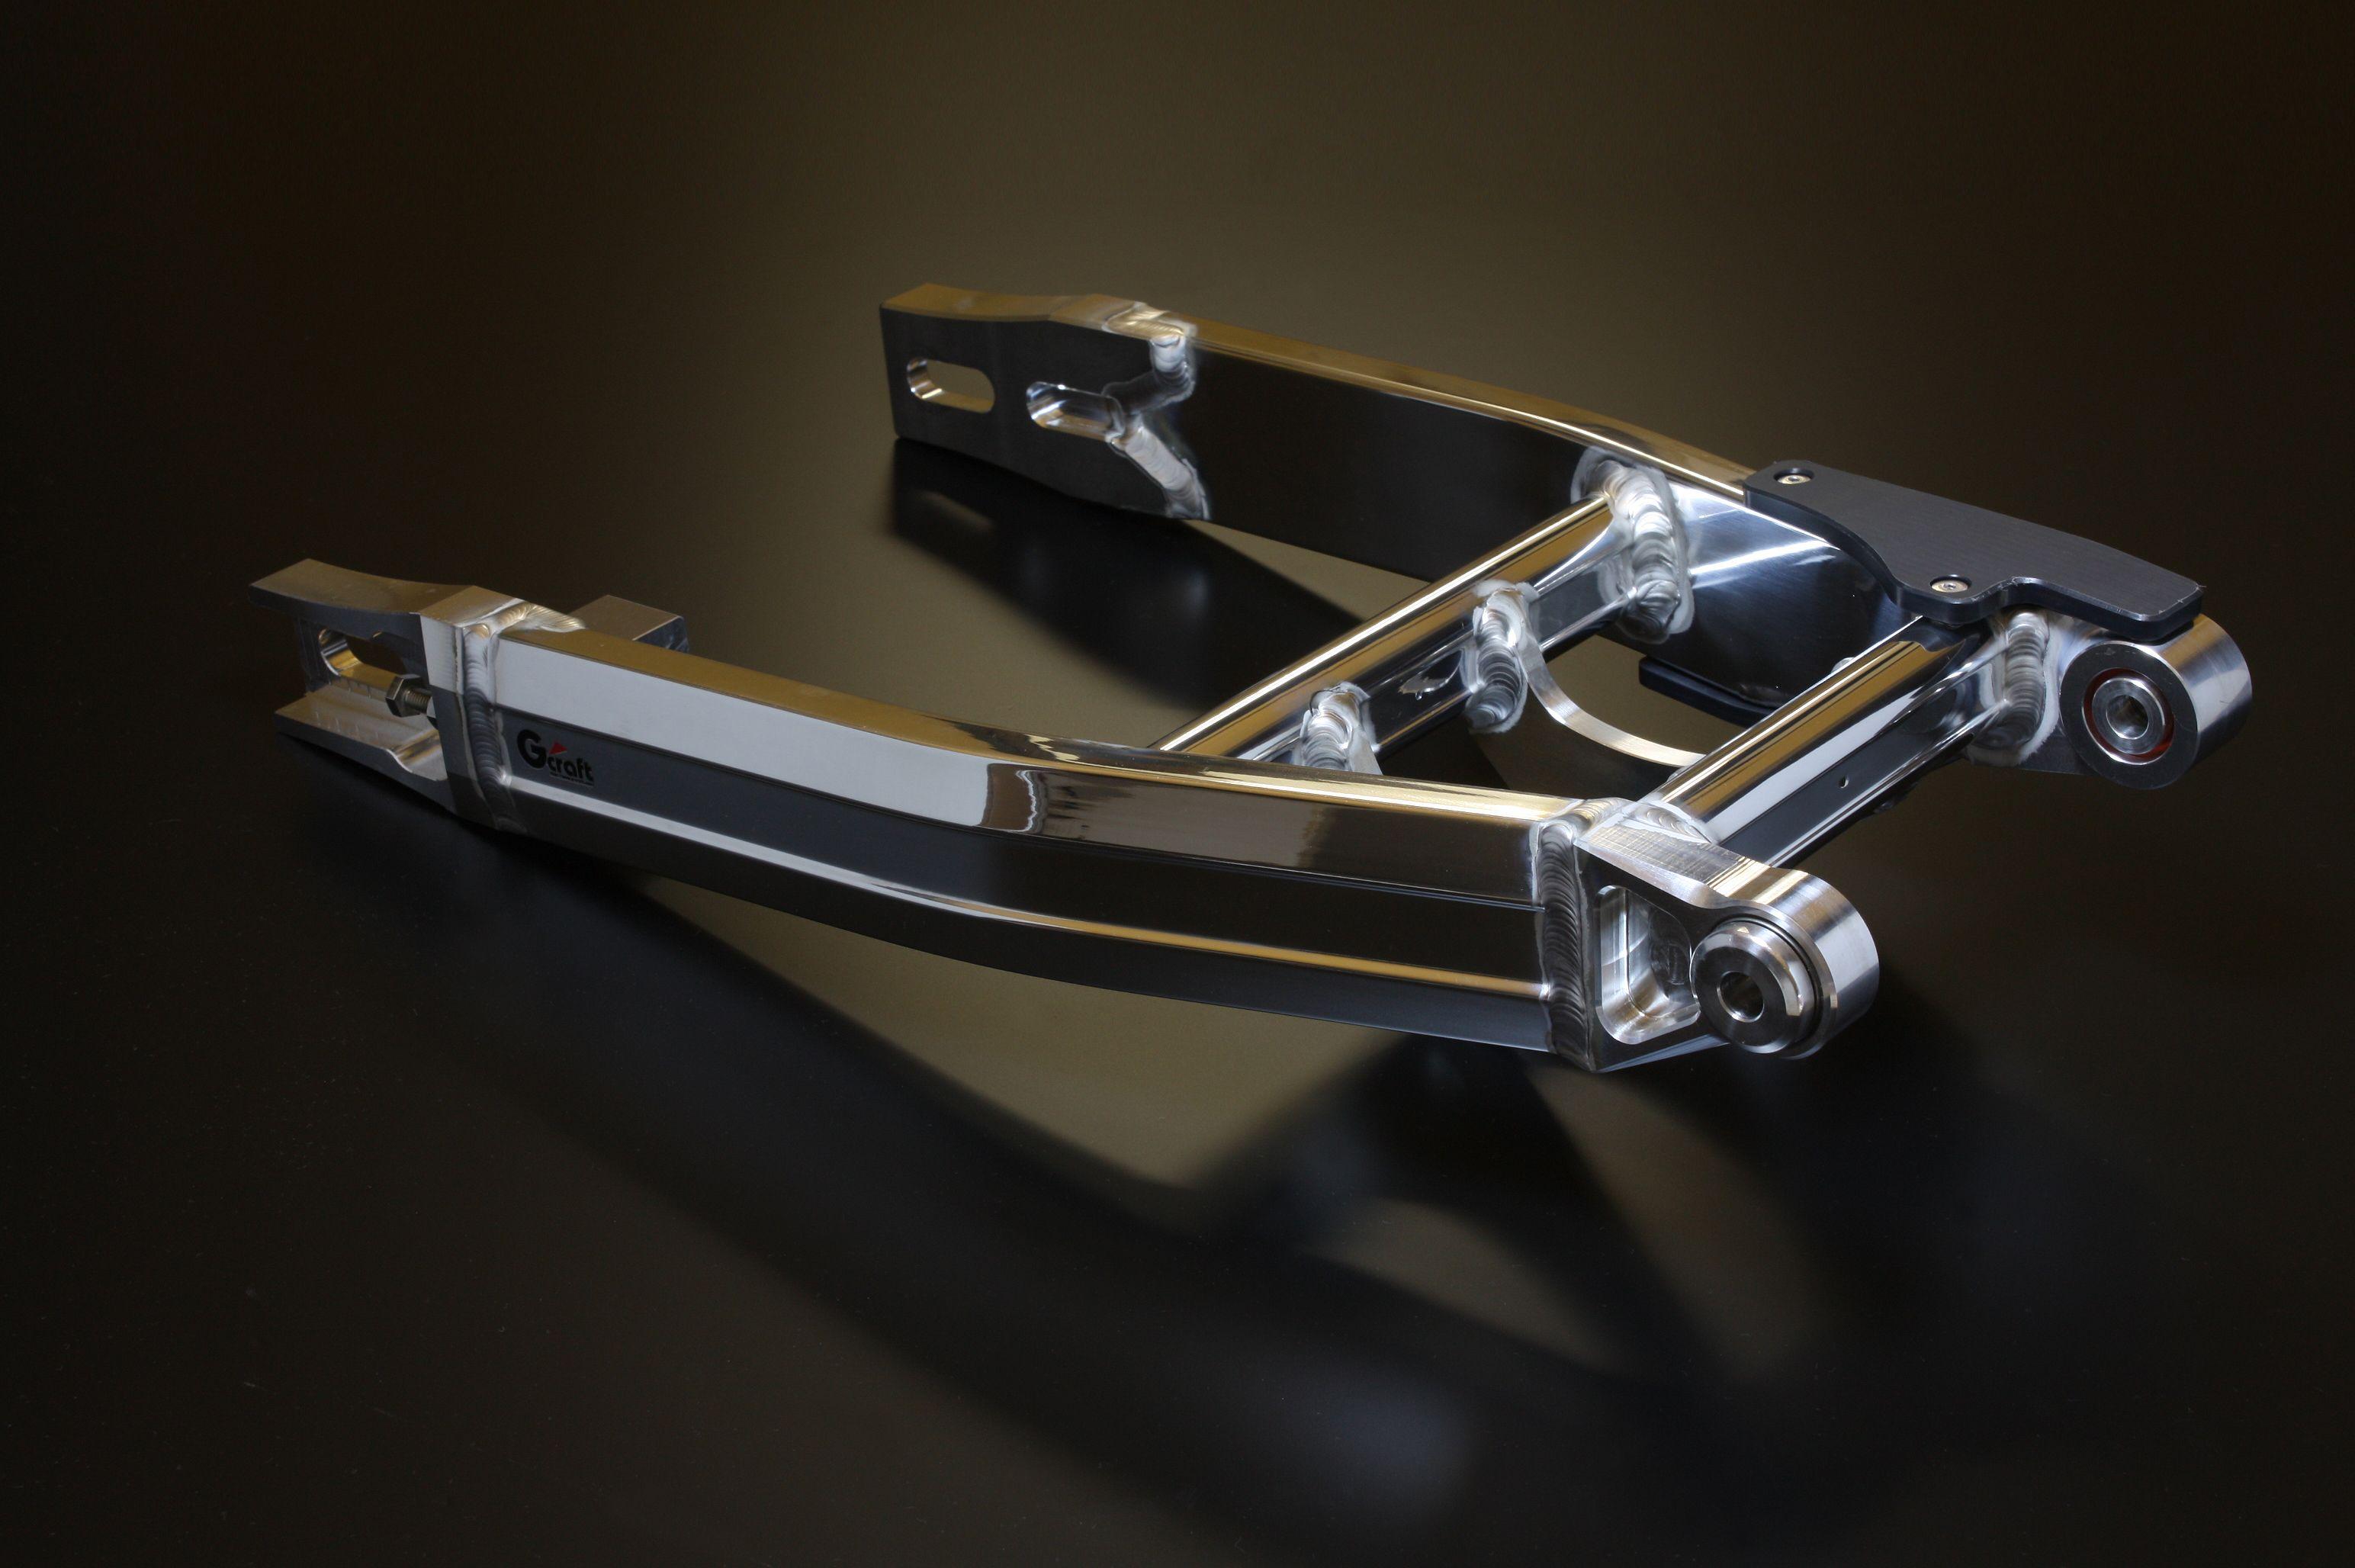 【G-Craft】超寬版MONO SHOCK多角型後搖臂 加長20cm - 「Webike-摩托百貨」